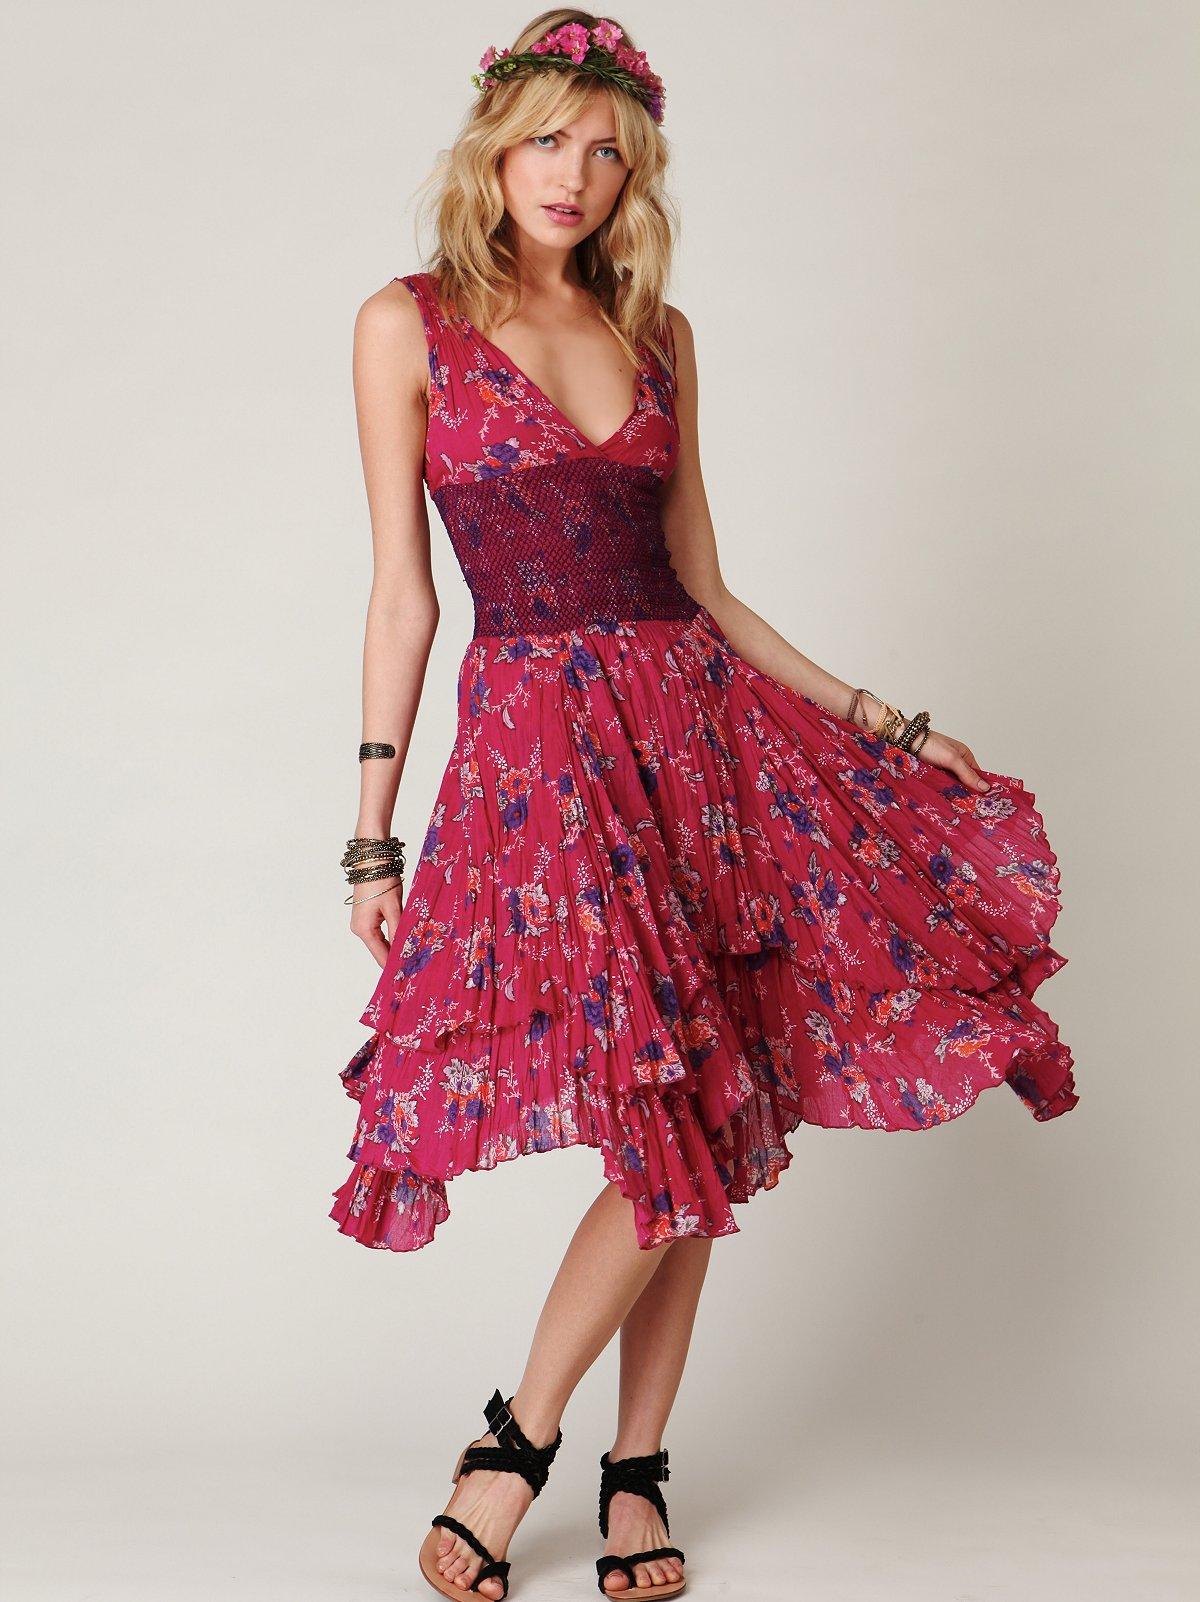 FP ONE Sunflower Wisteria Dress